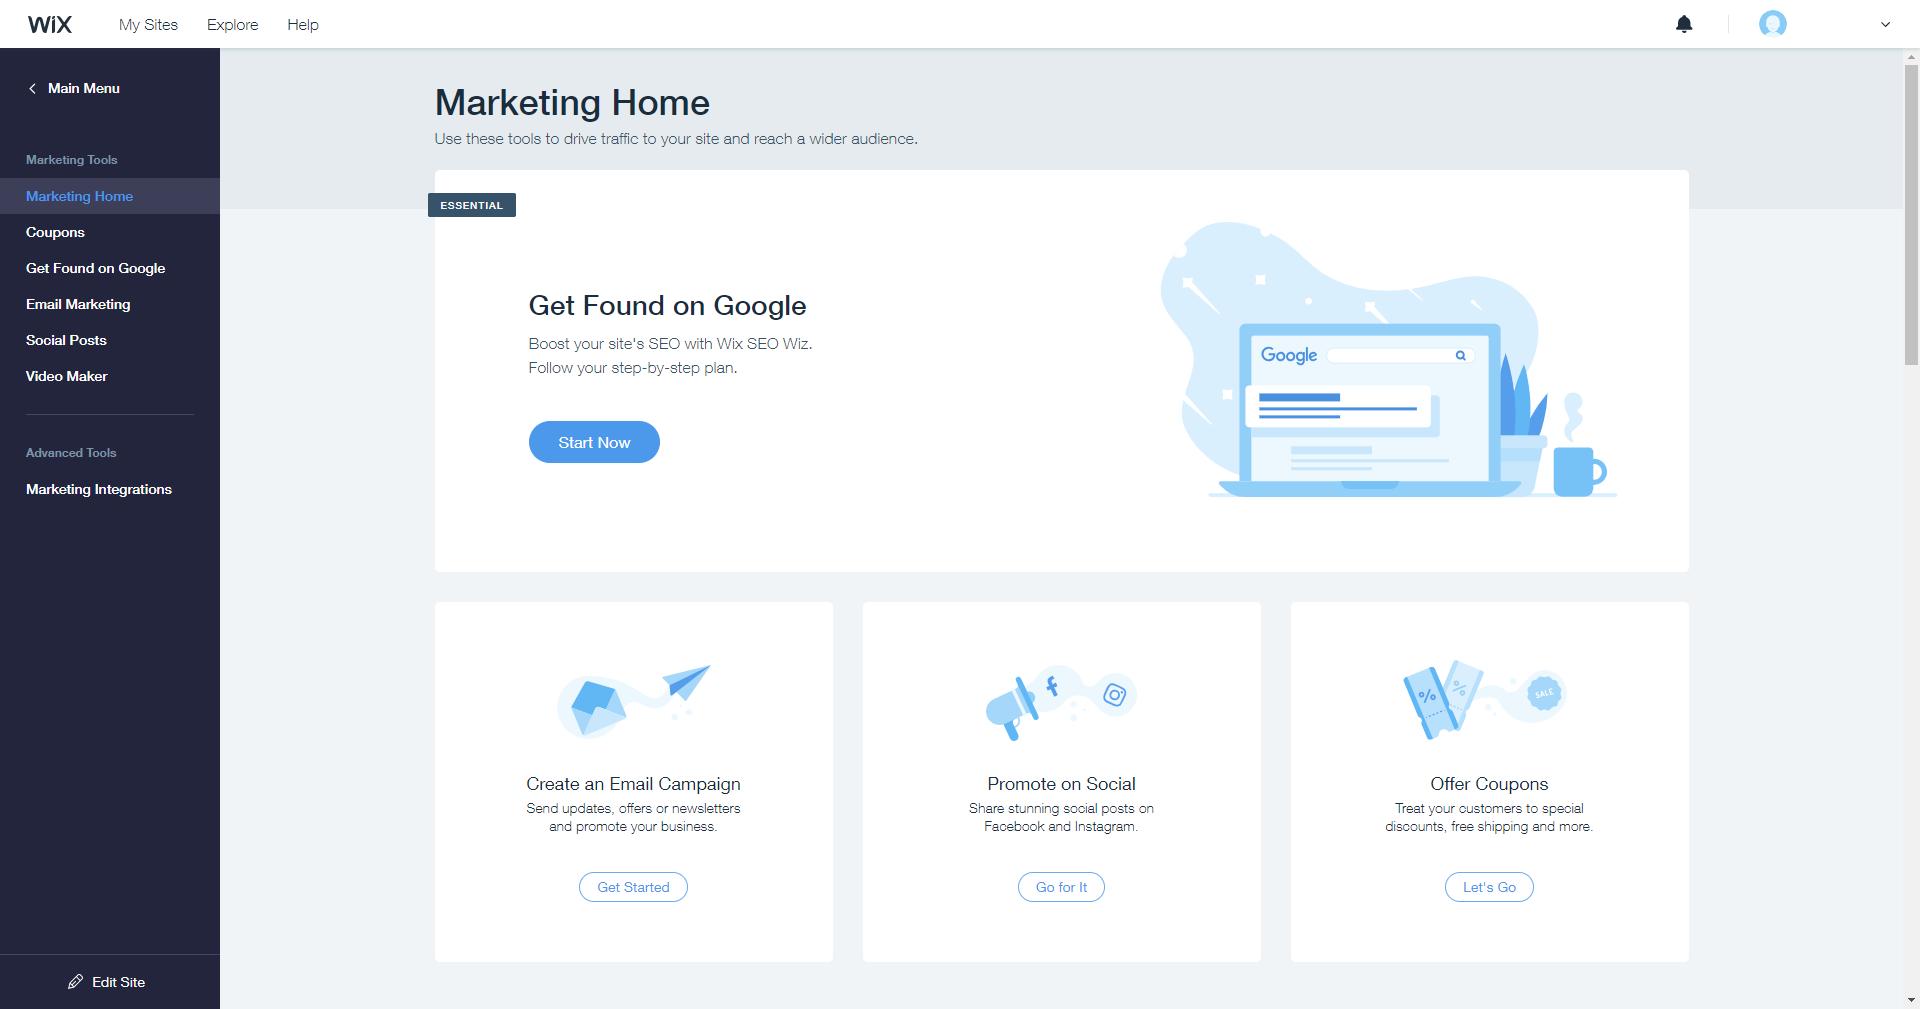 Wix Ascend marketing tools